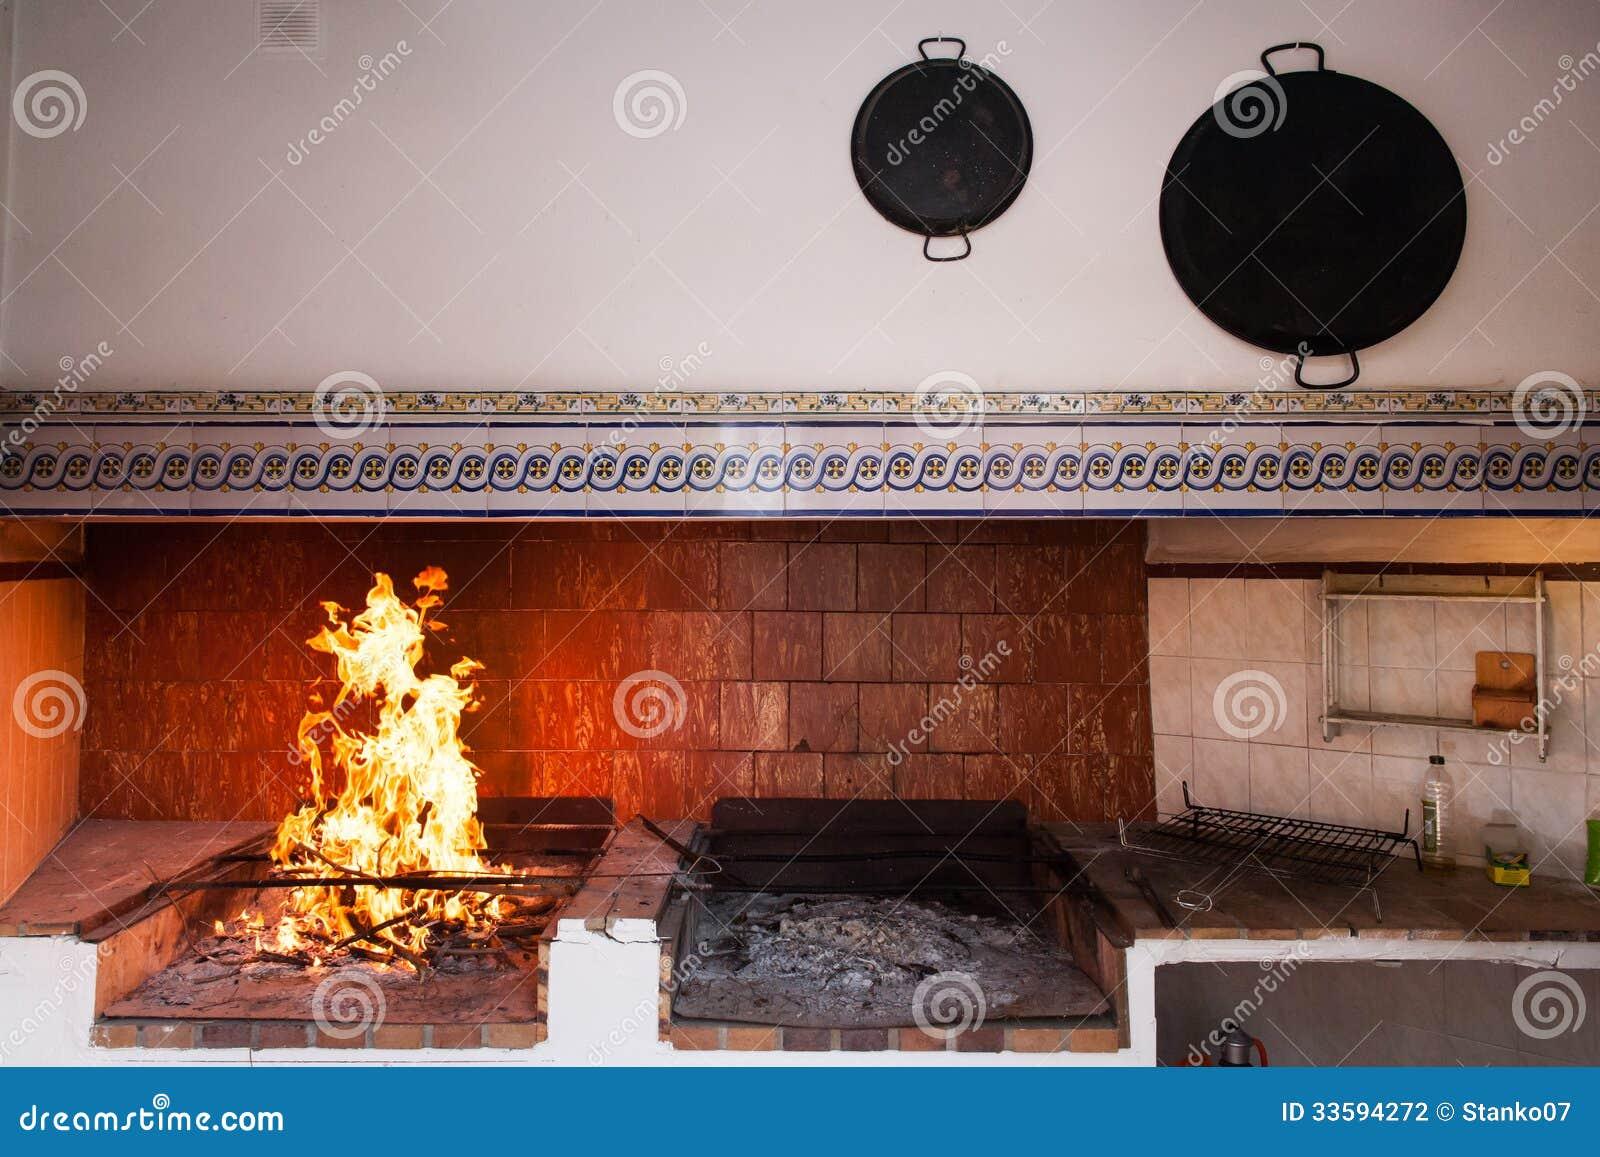 Rusty Spanish Country Kitchen. Stock Photo - Image: 33594272